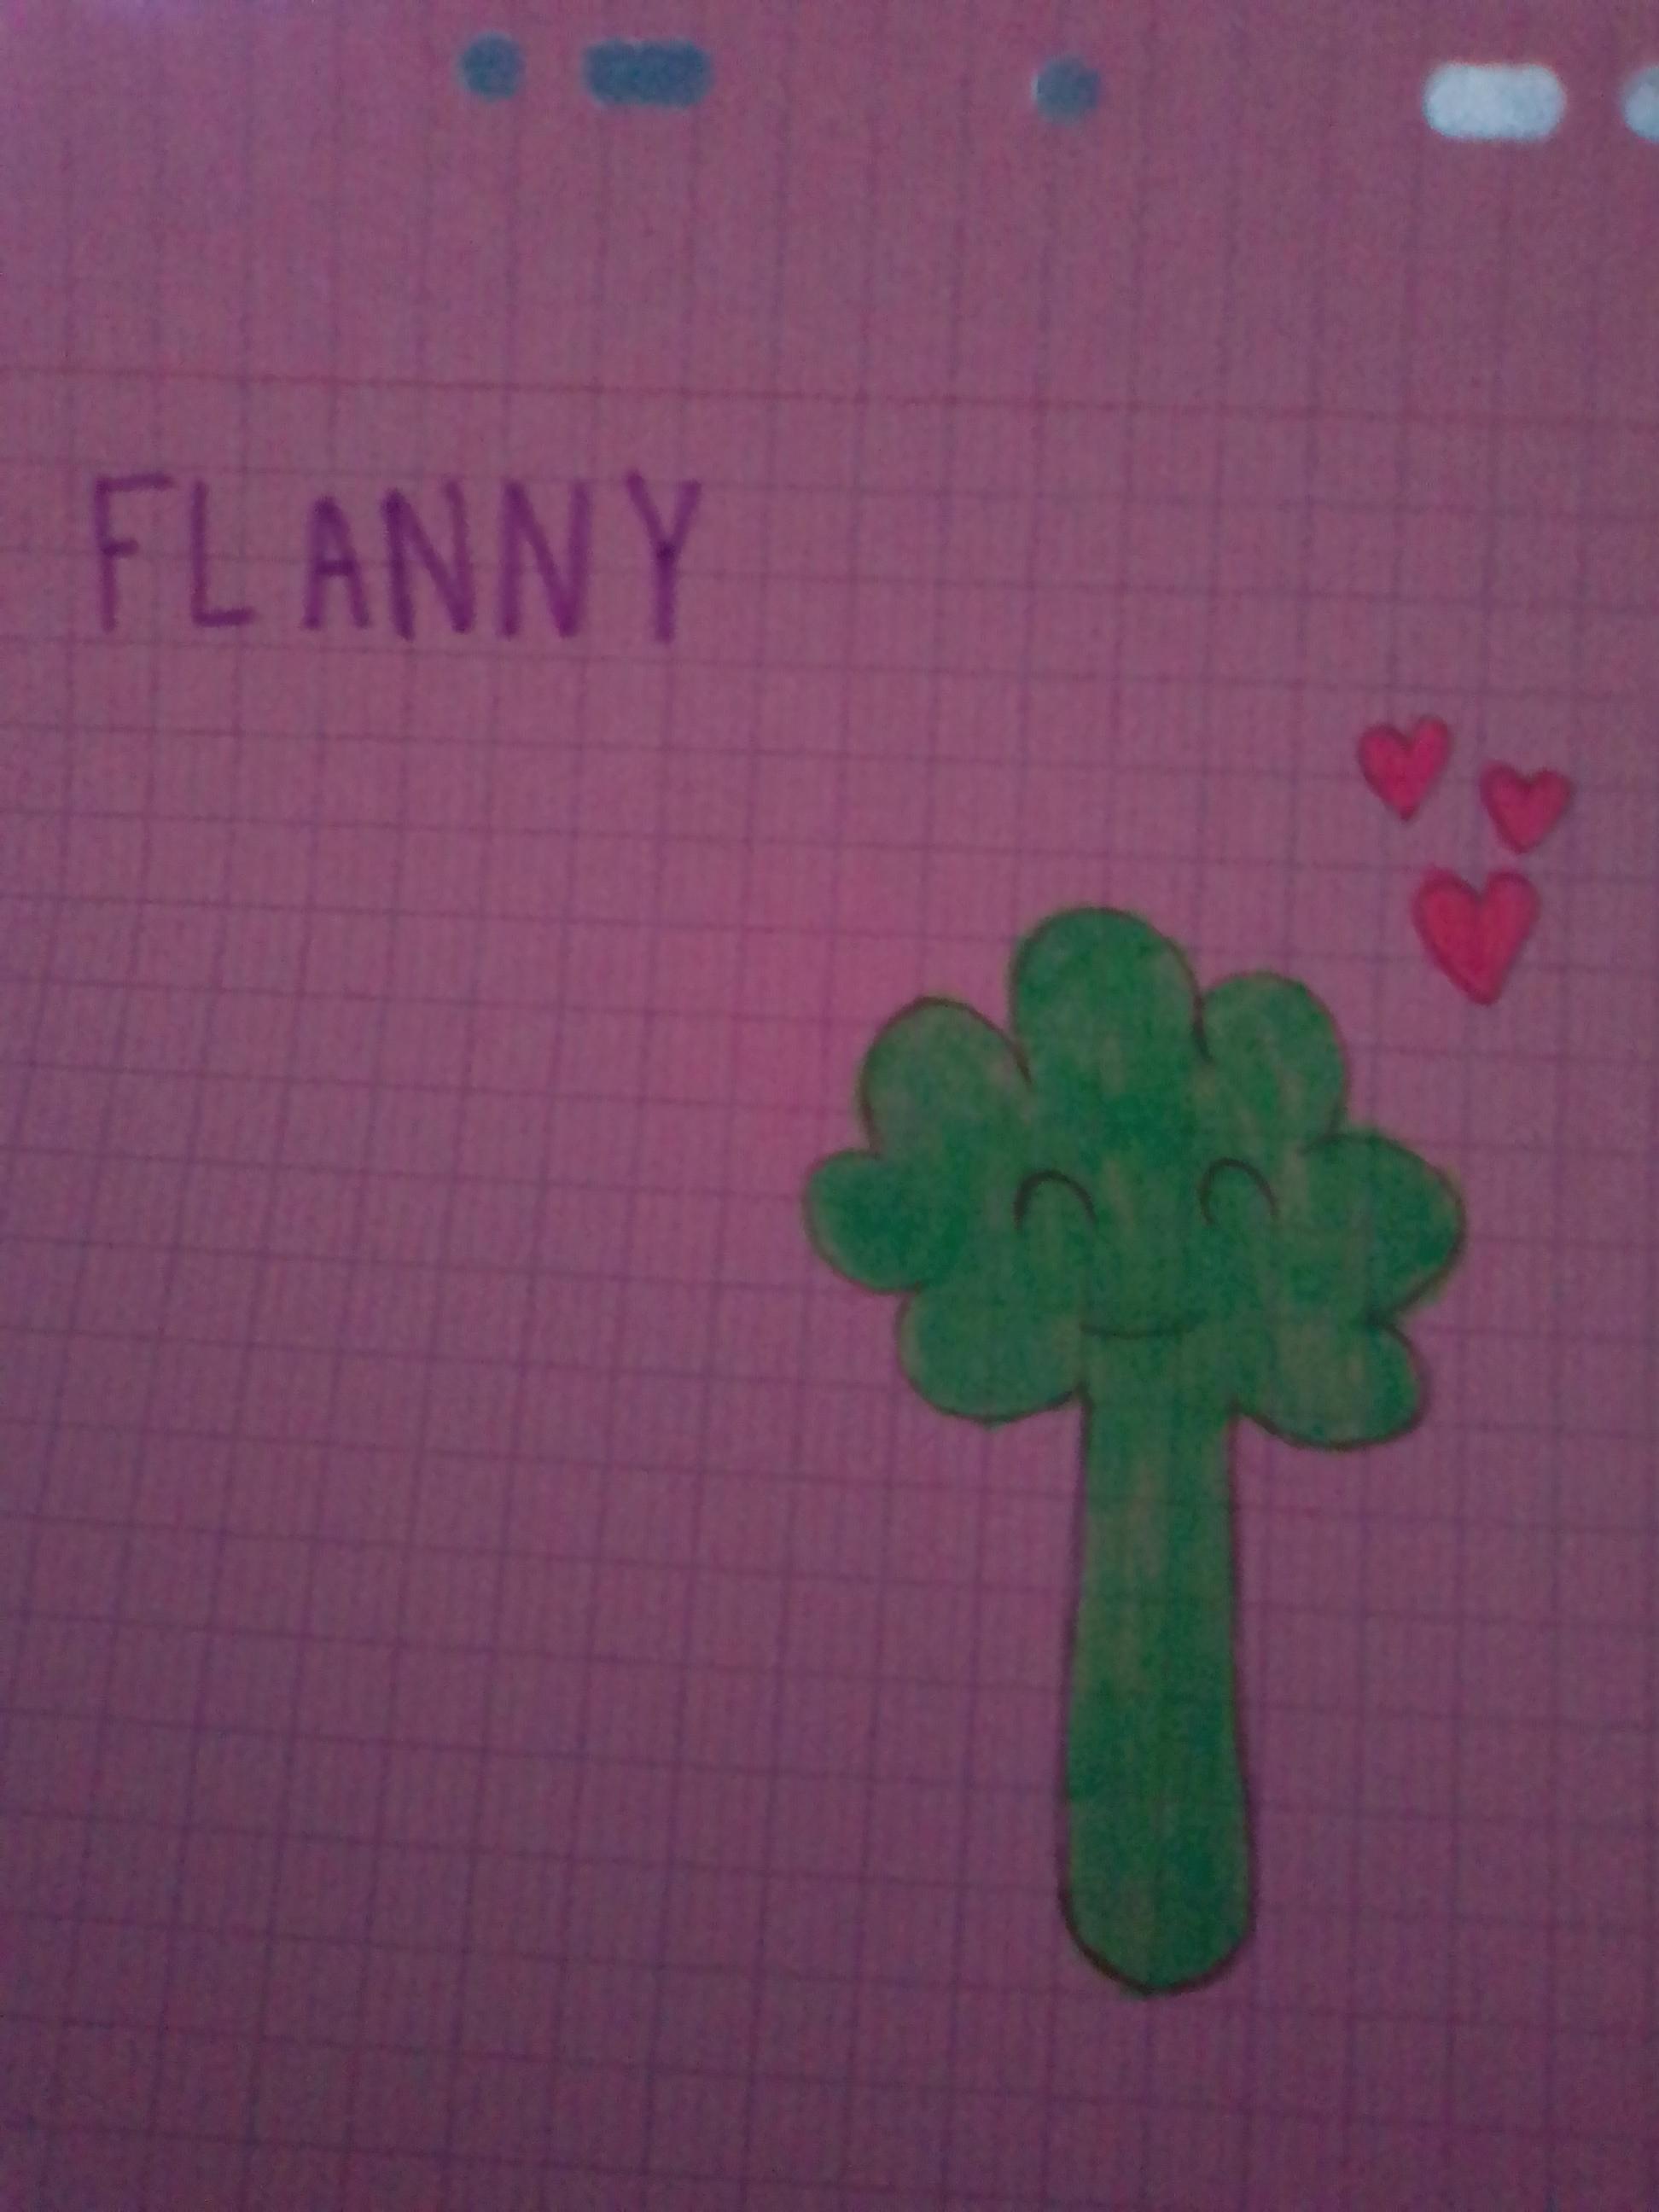 Brocoli Flanny